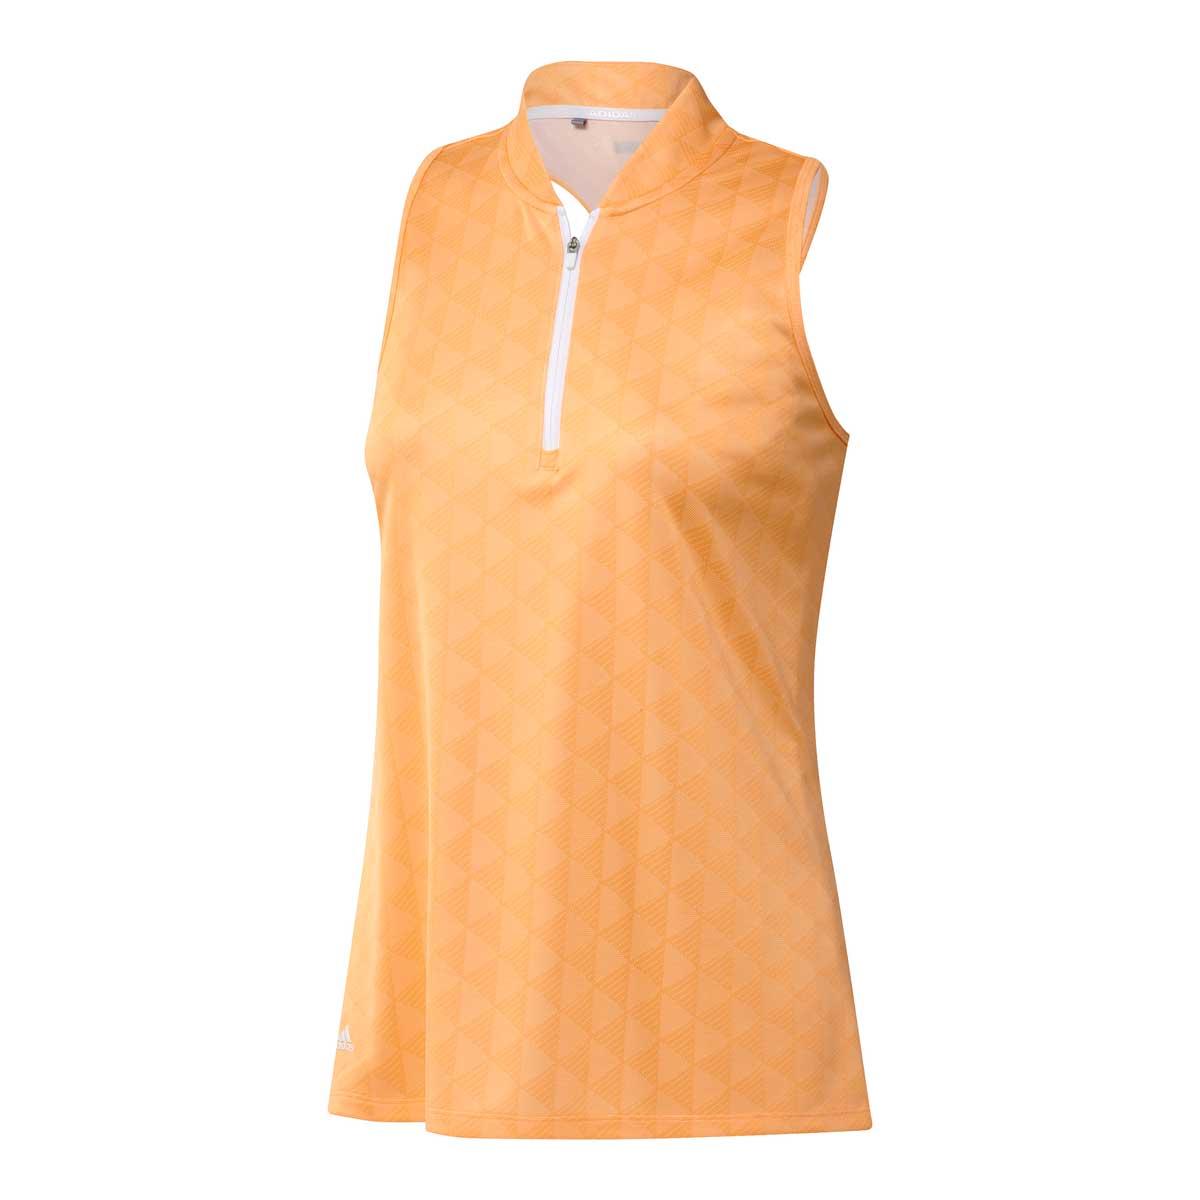 Adidas Women's Heat.RDY Racerback Sleeveless Acid Orange Polo